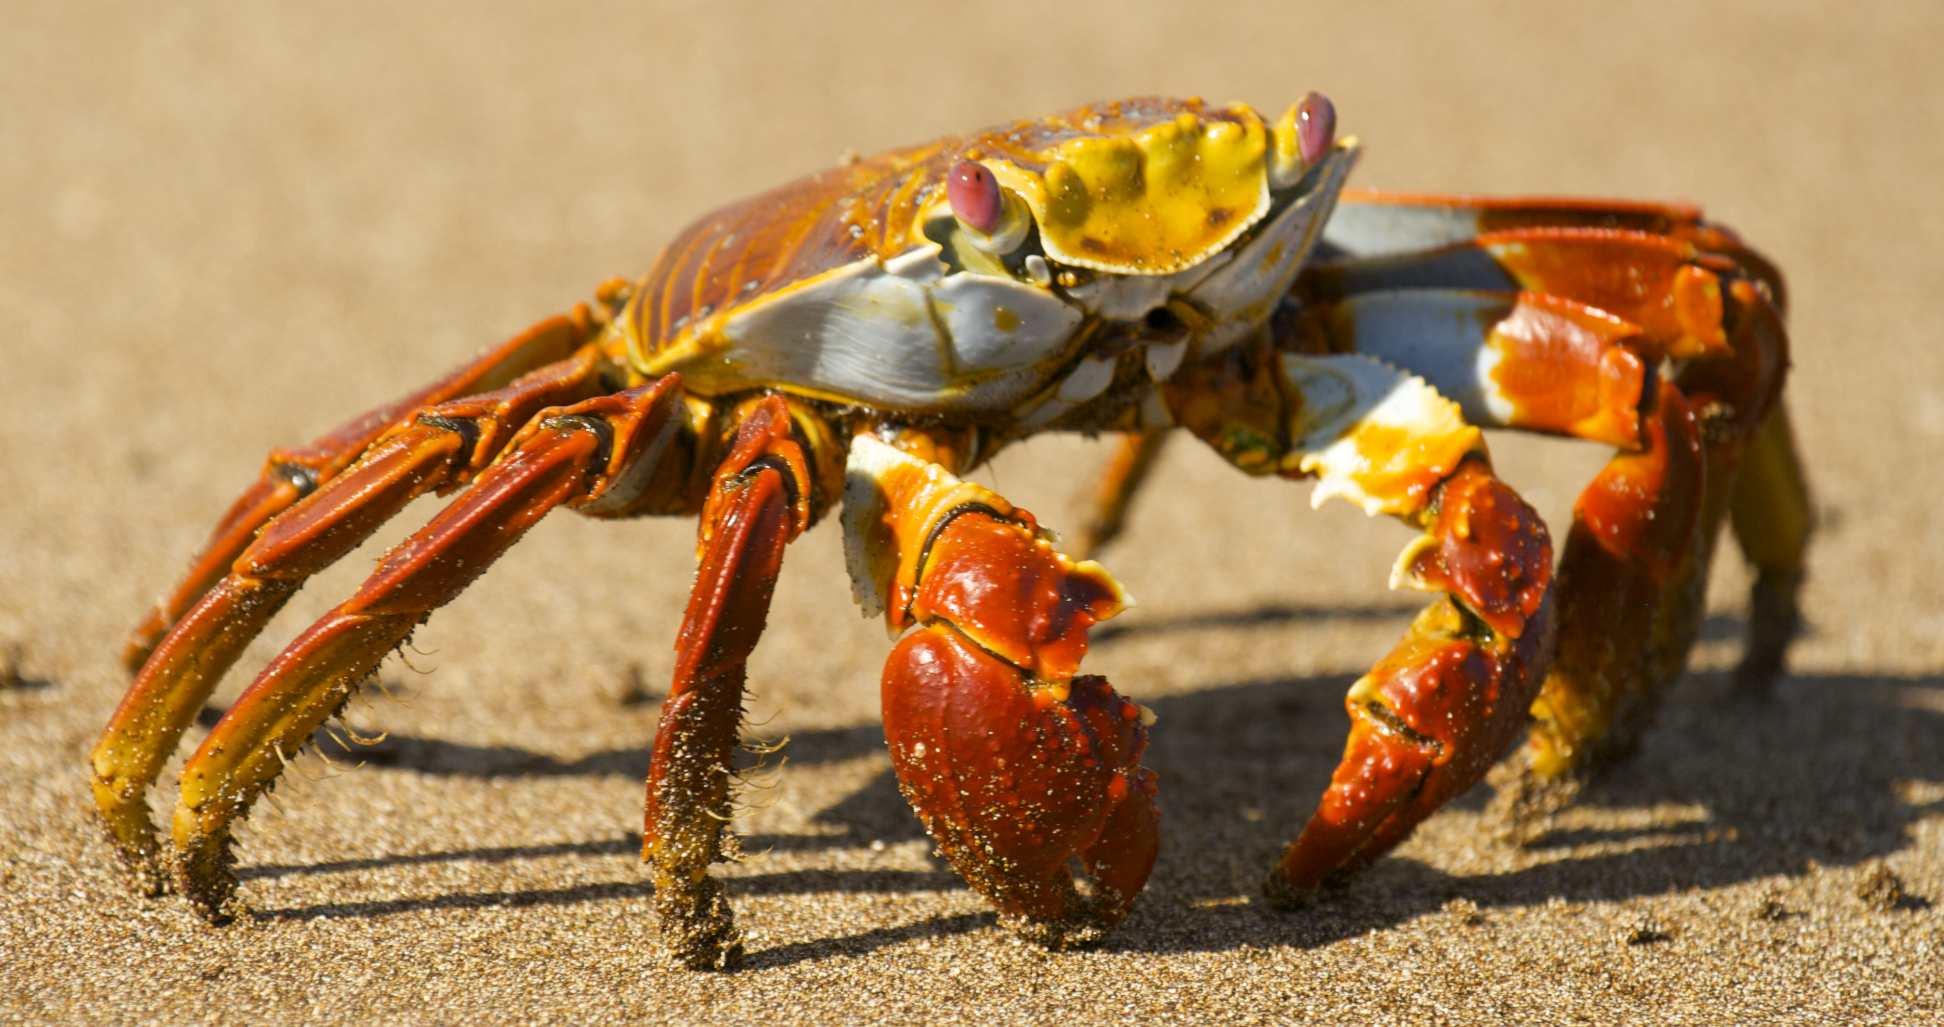 Sally Lightfoot Crab at Waters Edge. Credit  Benjamin Jakabek/Flickr  (CC BY-NC-ND 2.0)